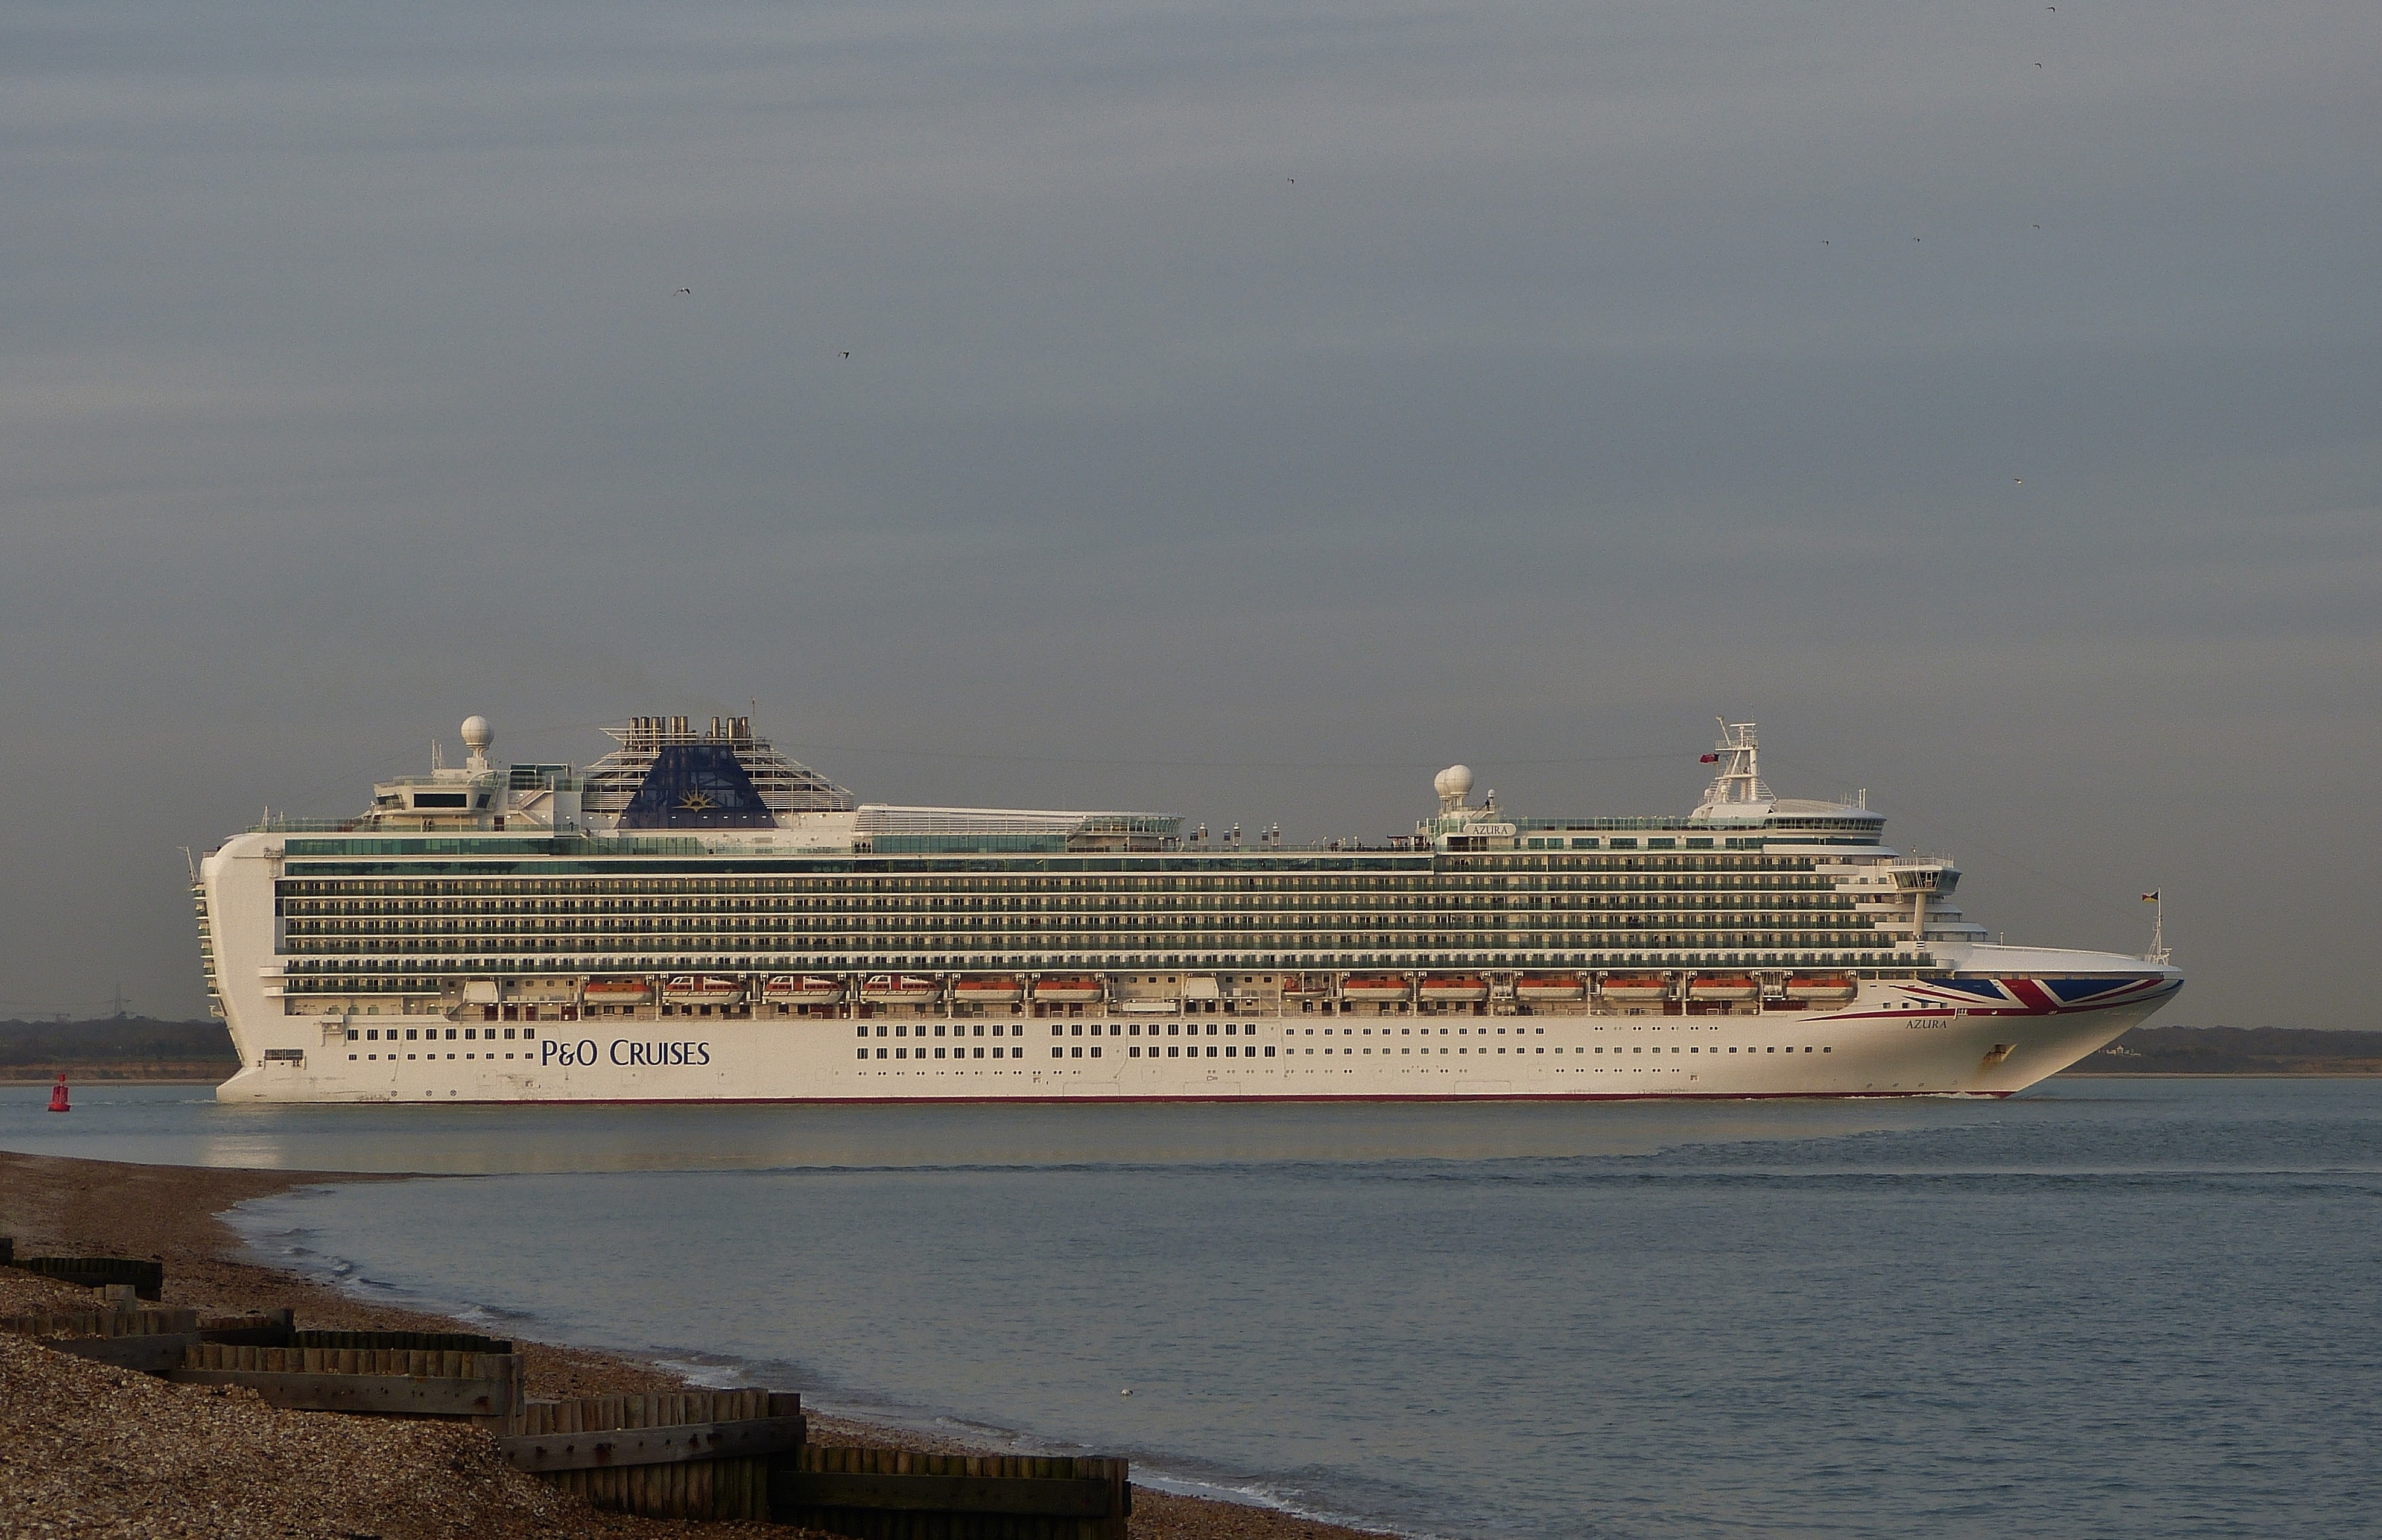 Calshot southampton cruise ship azura p&o